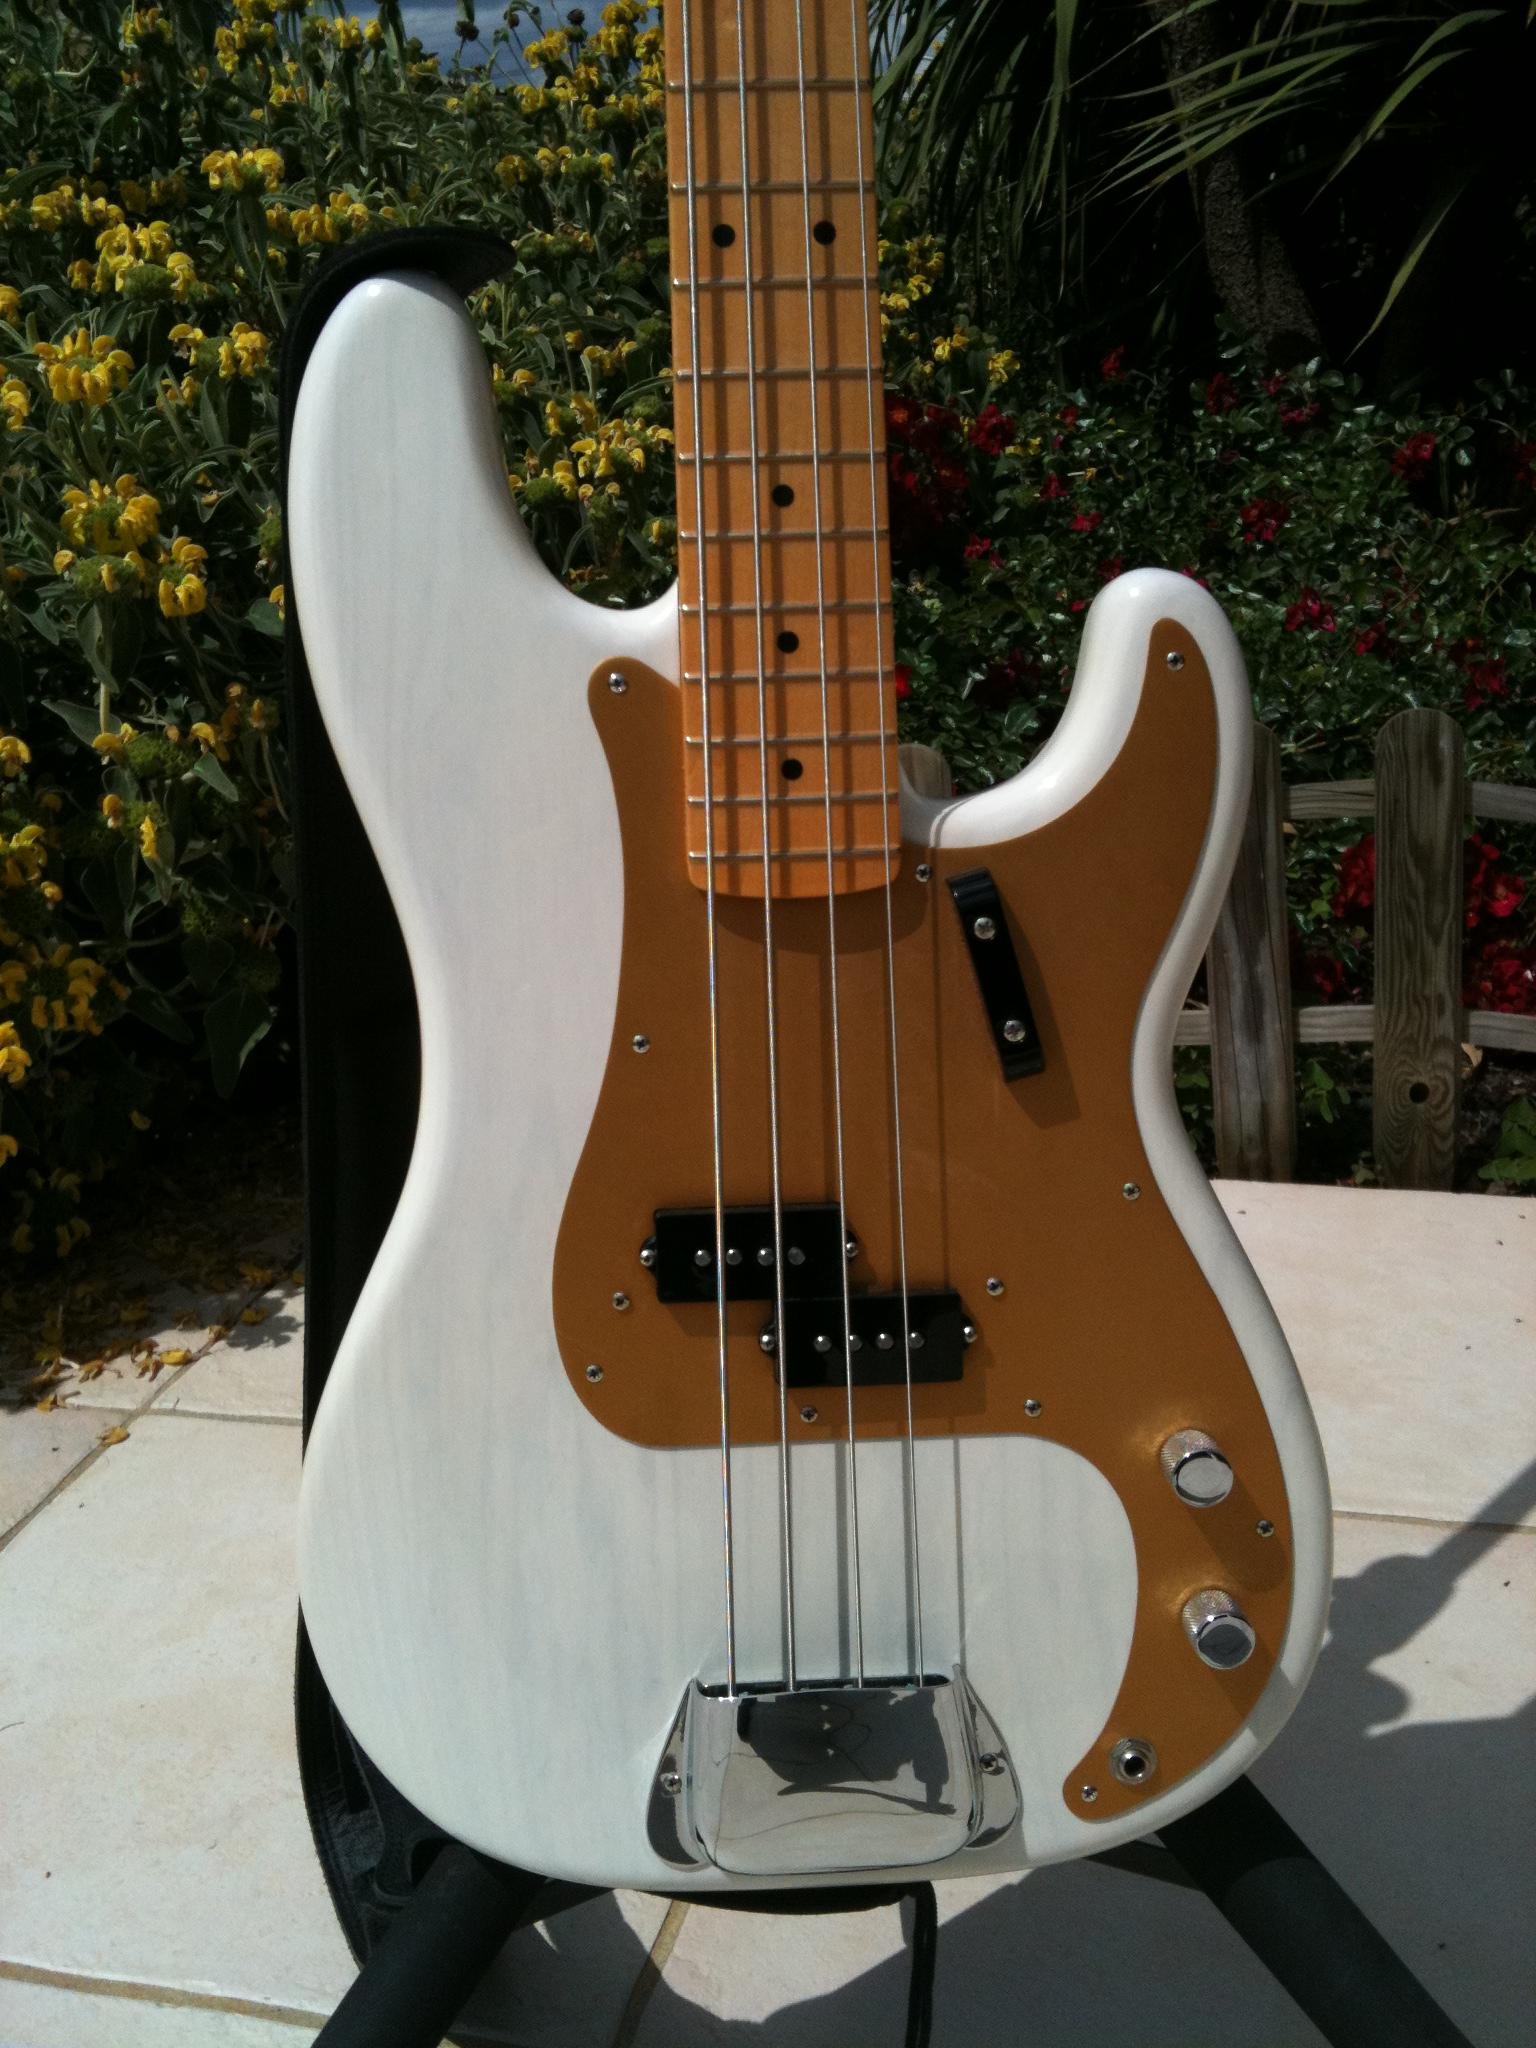 fender american vintage 39 57 precision bass image 344825 audiofanzine. Black Bedroom Furniture Sets. Home Design Ideas